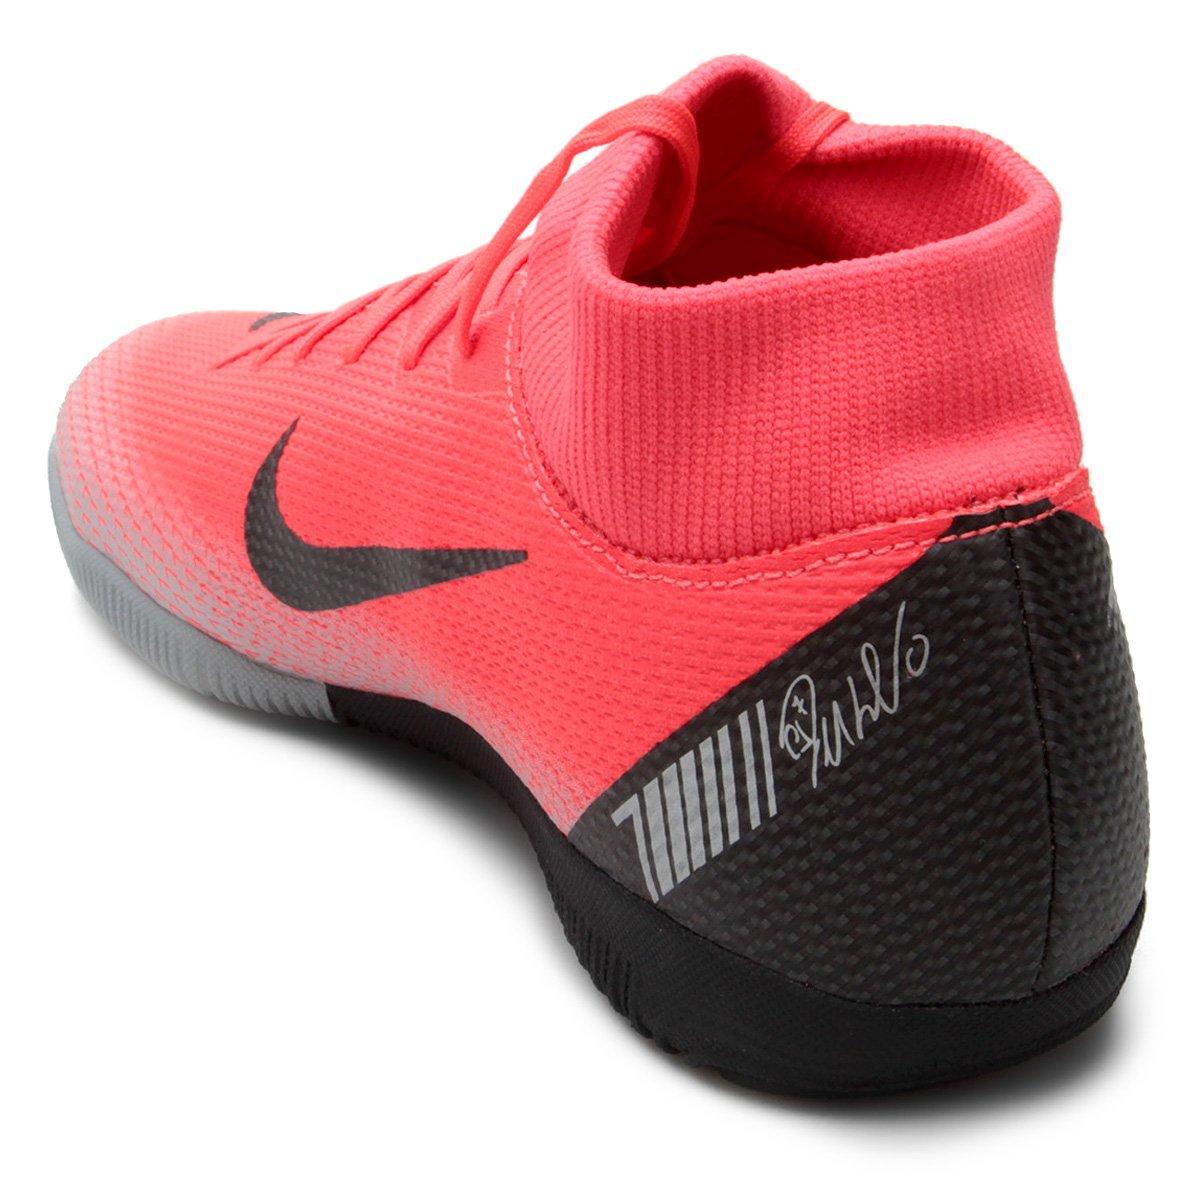 a1641cbb8a Chuteira Futsal Nike Mercurial Superfly 6 Academy CR7 IC - Vermelho ...